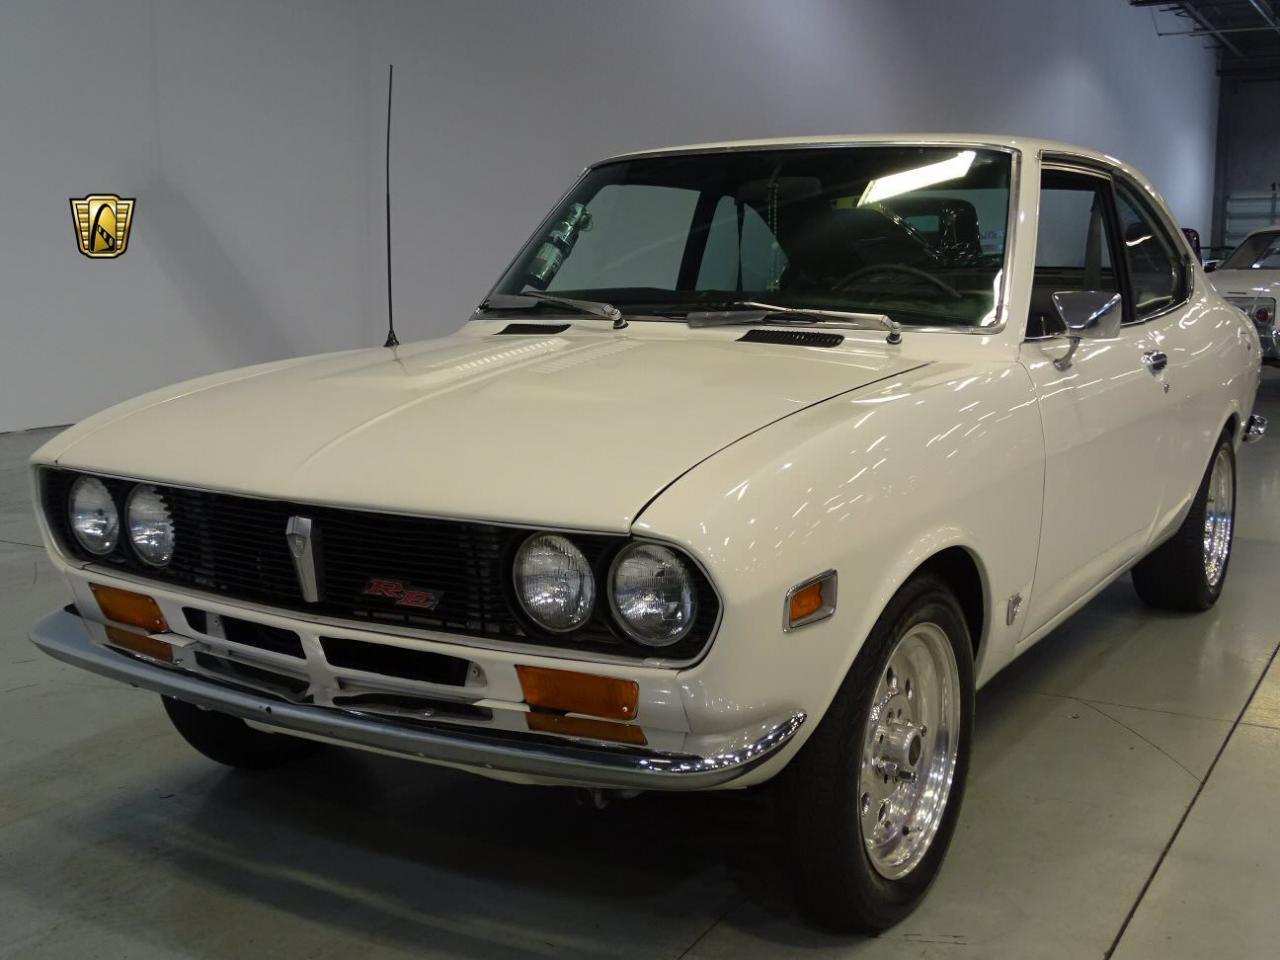 Florida Mazda Dealers >> 1973 Mazda RX2 for Sale | ClassicCars.com | CC-950864